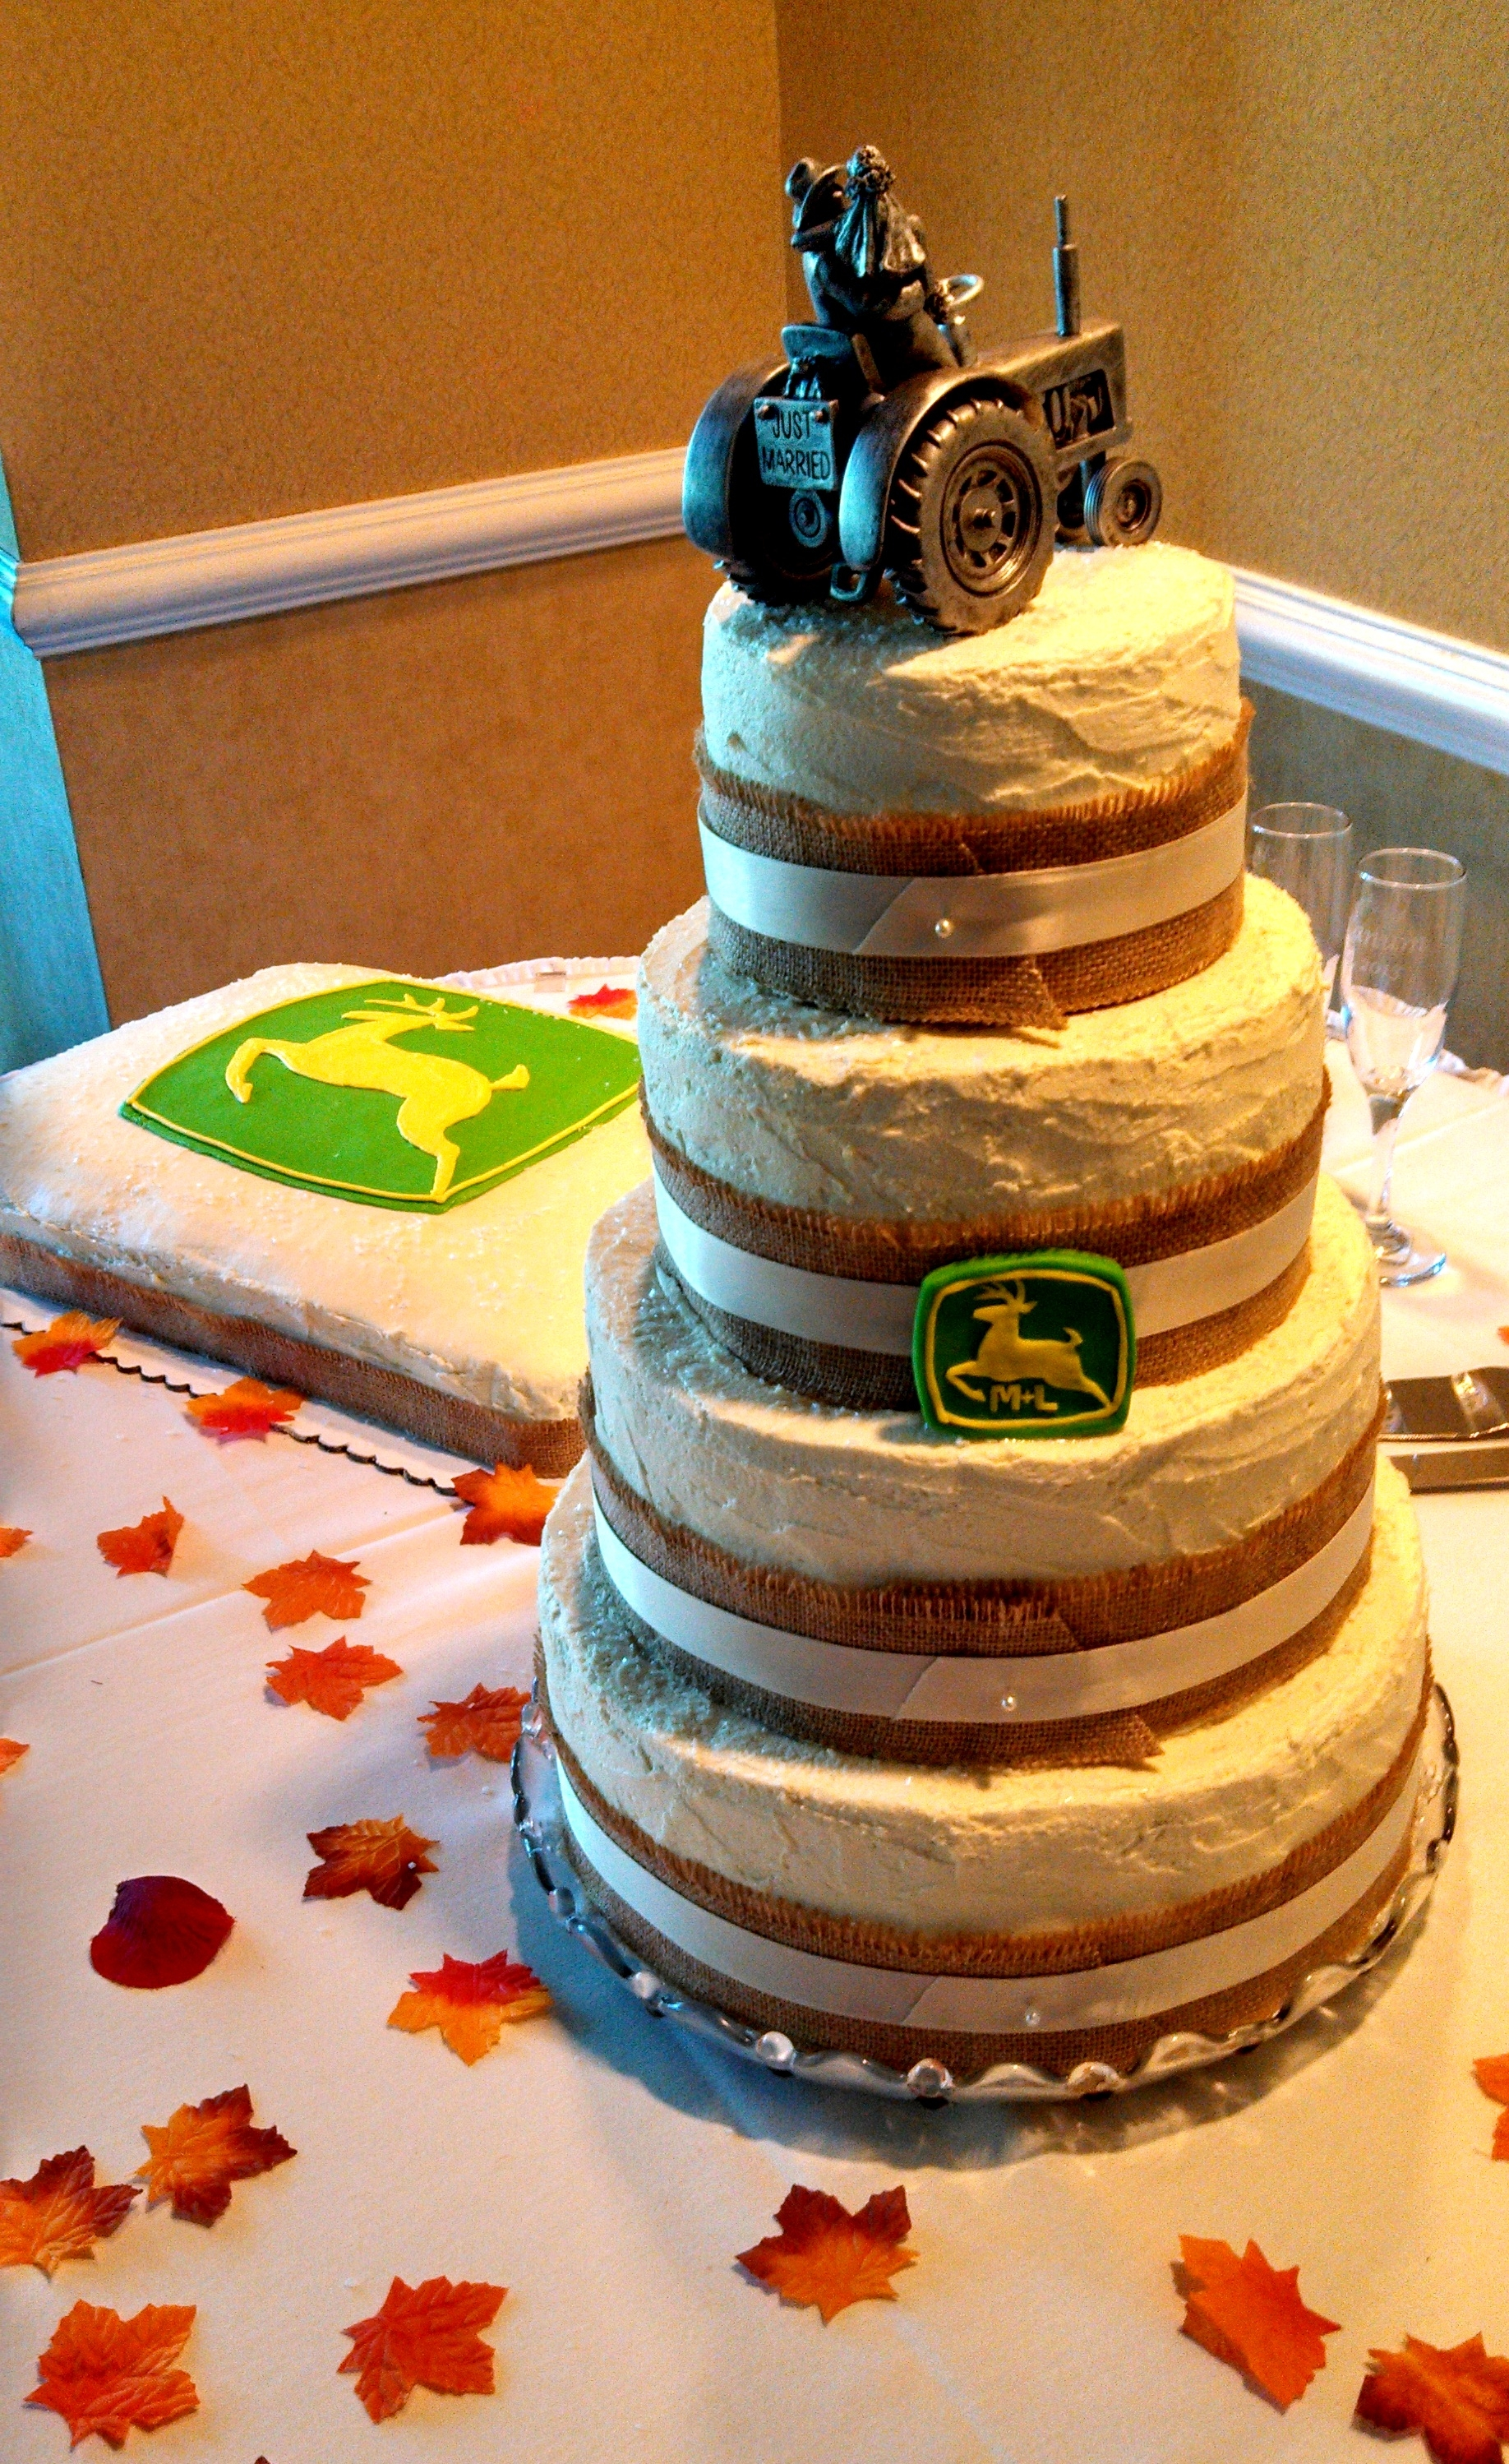 Rustic 4 Tier Wedding Cake And John Deere Groom S Cake